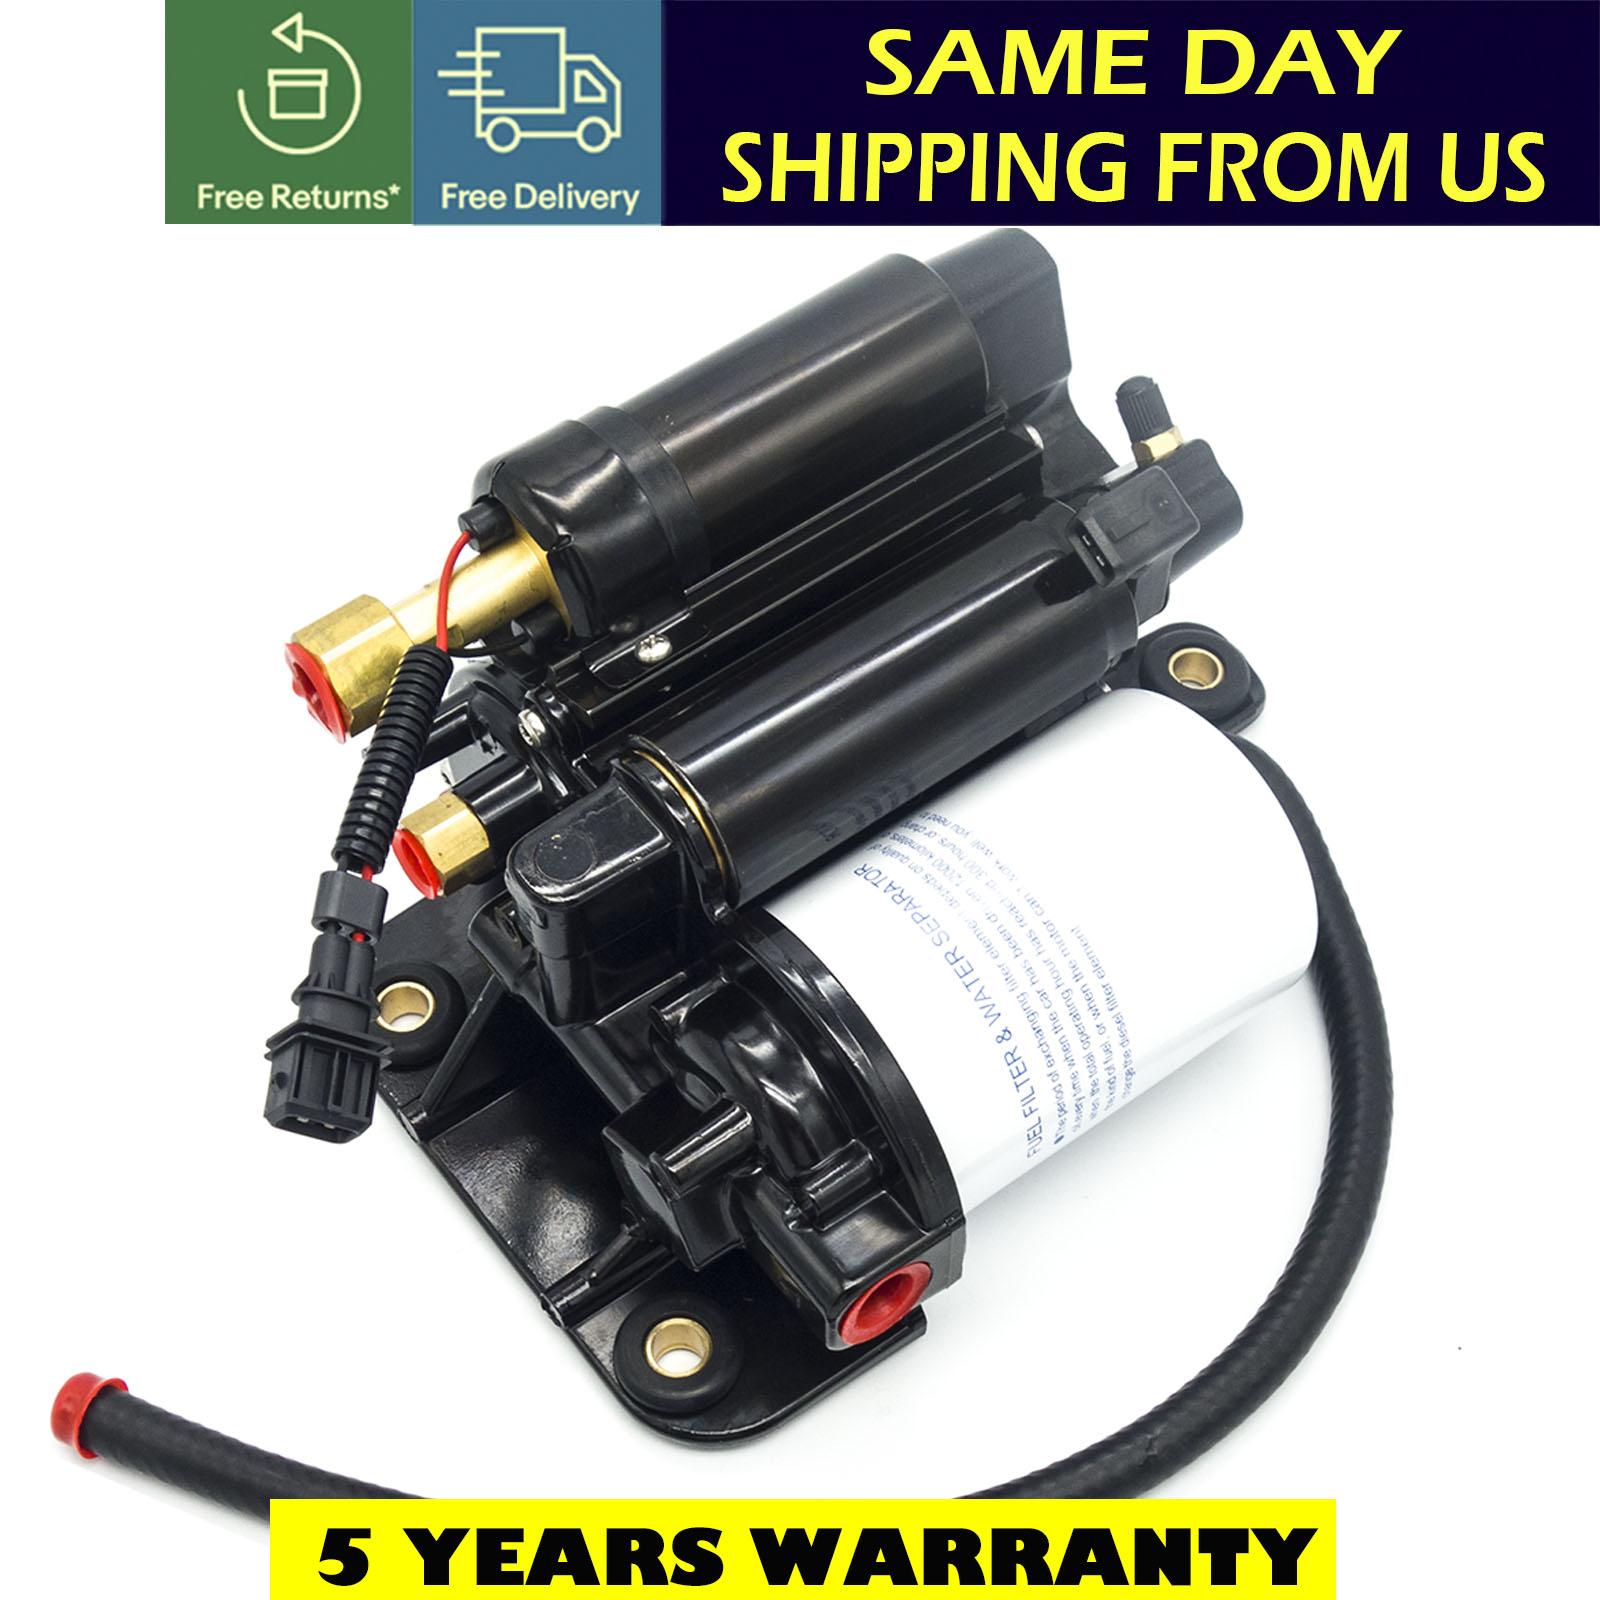 New Electric Fuel Pump Assembly FIT Volvo Penta 4.3L 5.0L 5.7L 21608511 21397771